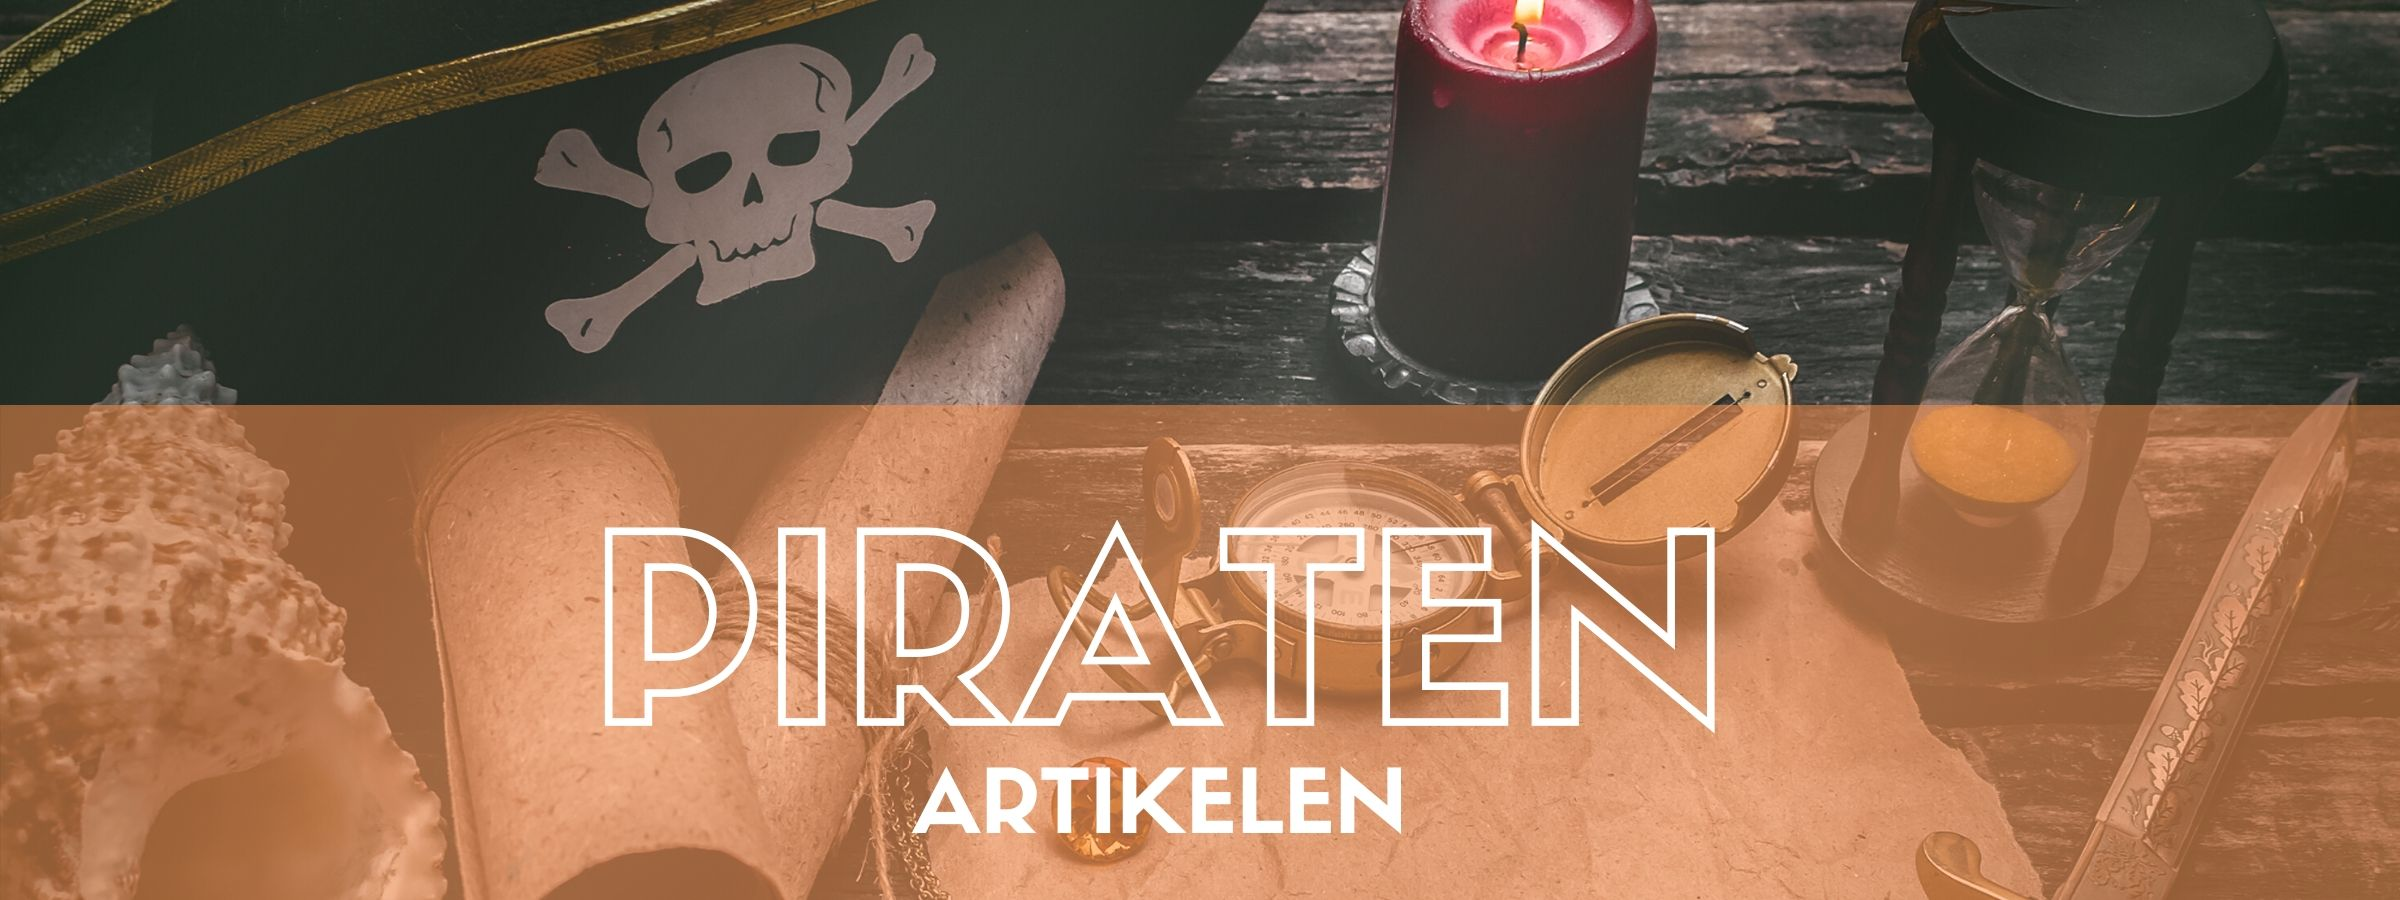 Piraten artikelen bestellen bij JB Feestartikelen